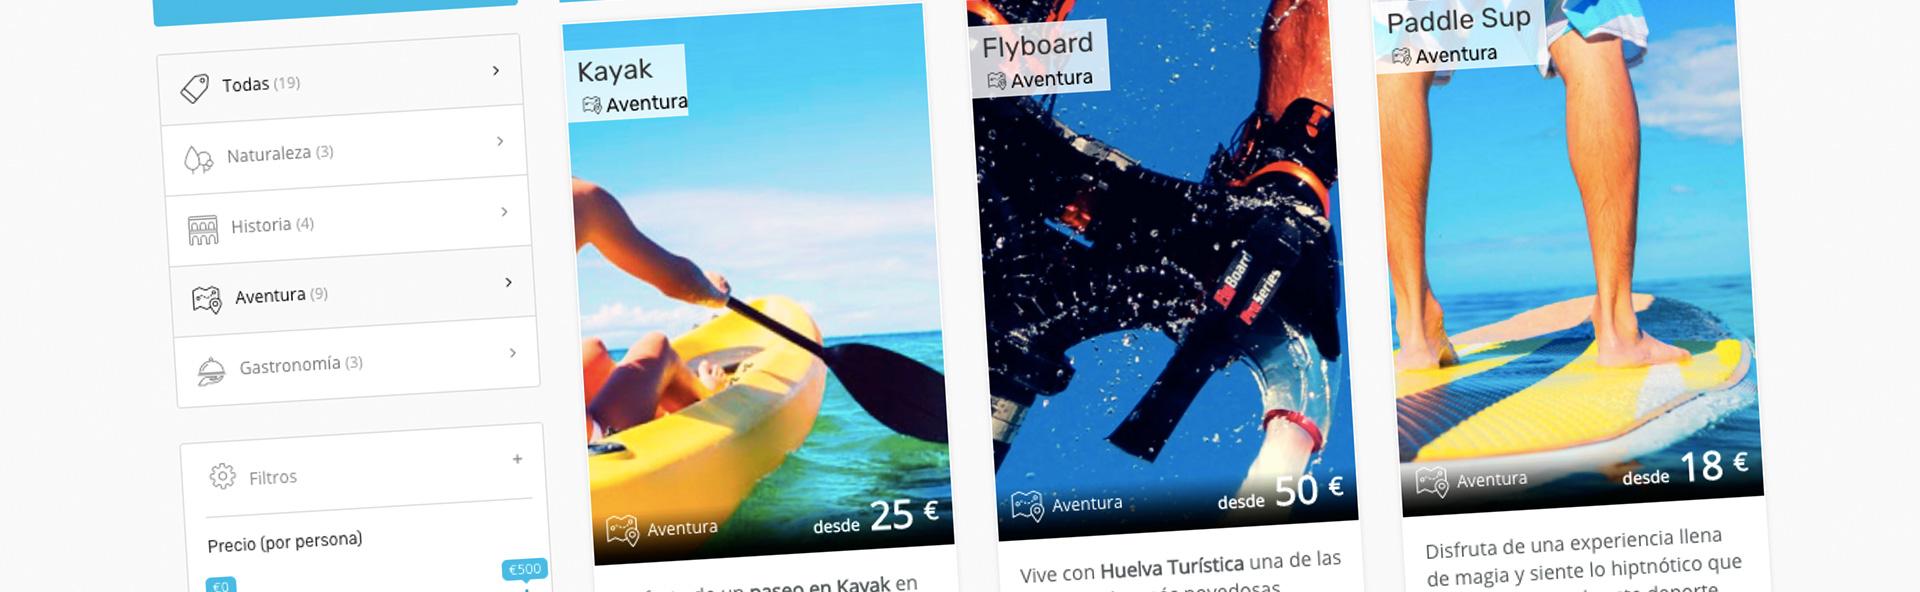 Ofertas de turismo en Huelva